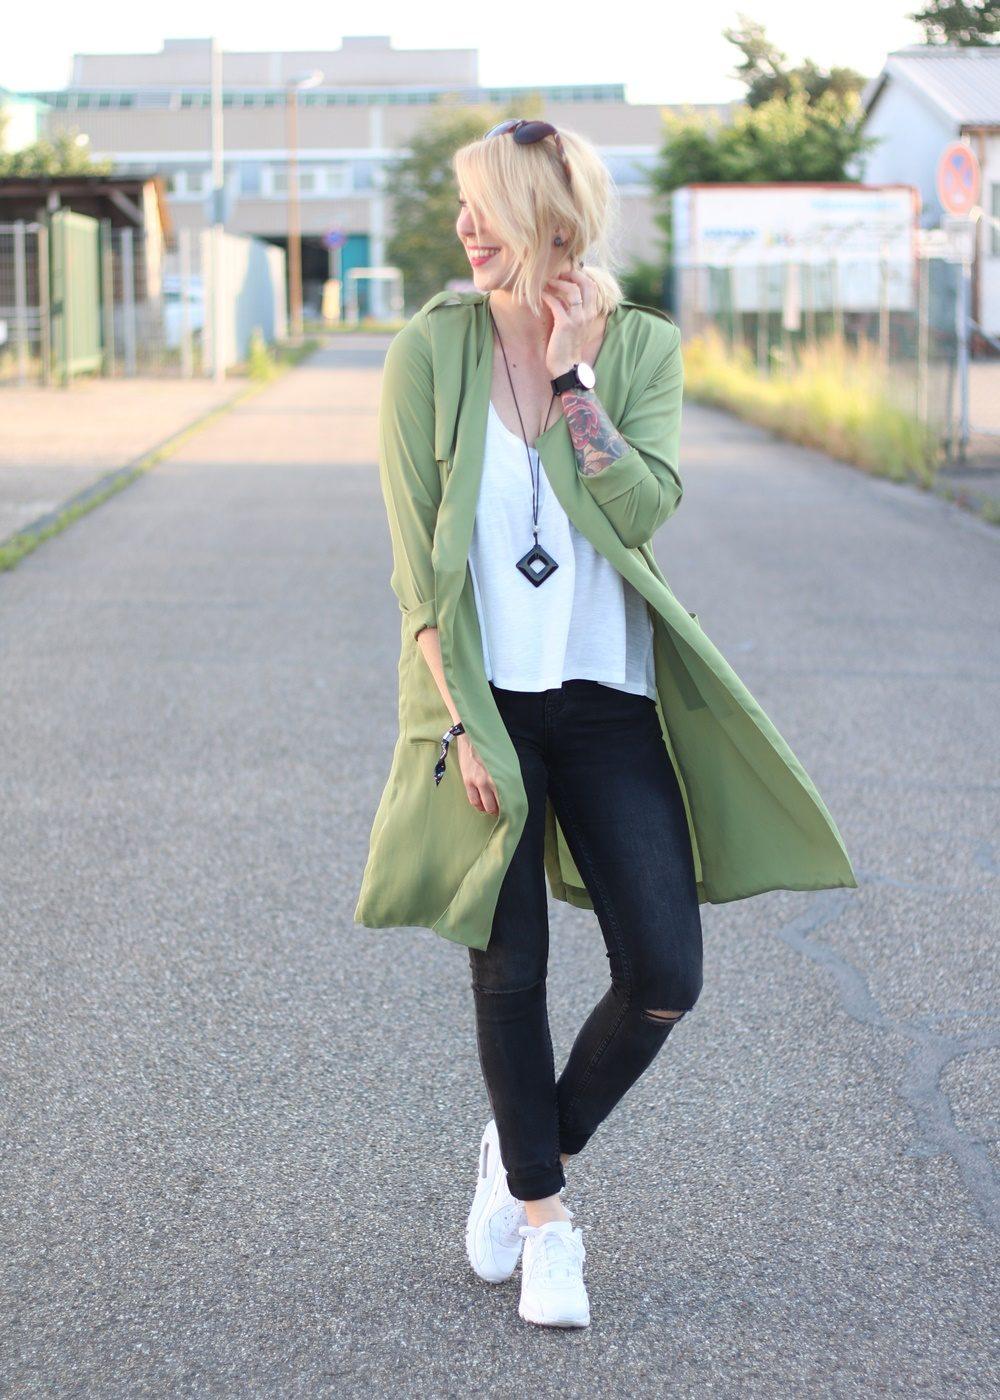 Fashionbloggerin Karlsruhe Outfit Parka Nike Air Max Sonnenbrille (3)